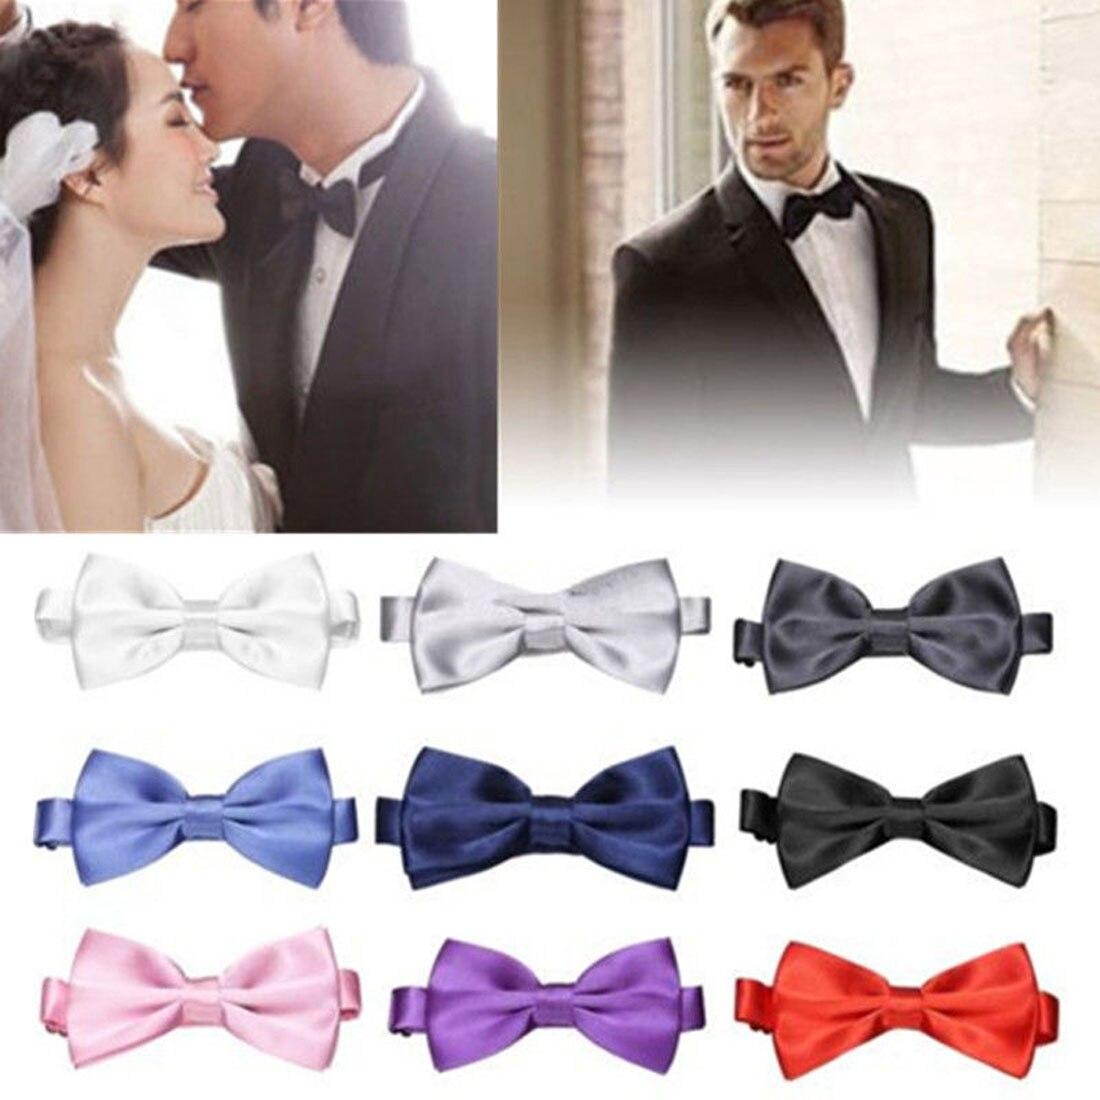 Bowtie Men Formal Necktie Boy Men's Fashion Business Wedding Bow Tie Male Dress Shirt Gift Men Tuxedo Solid Butterfly Bowtie